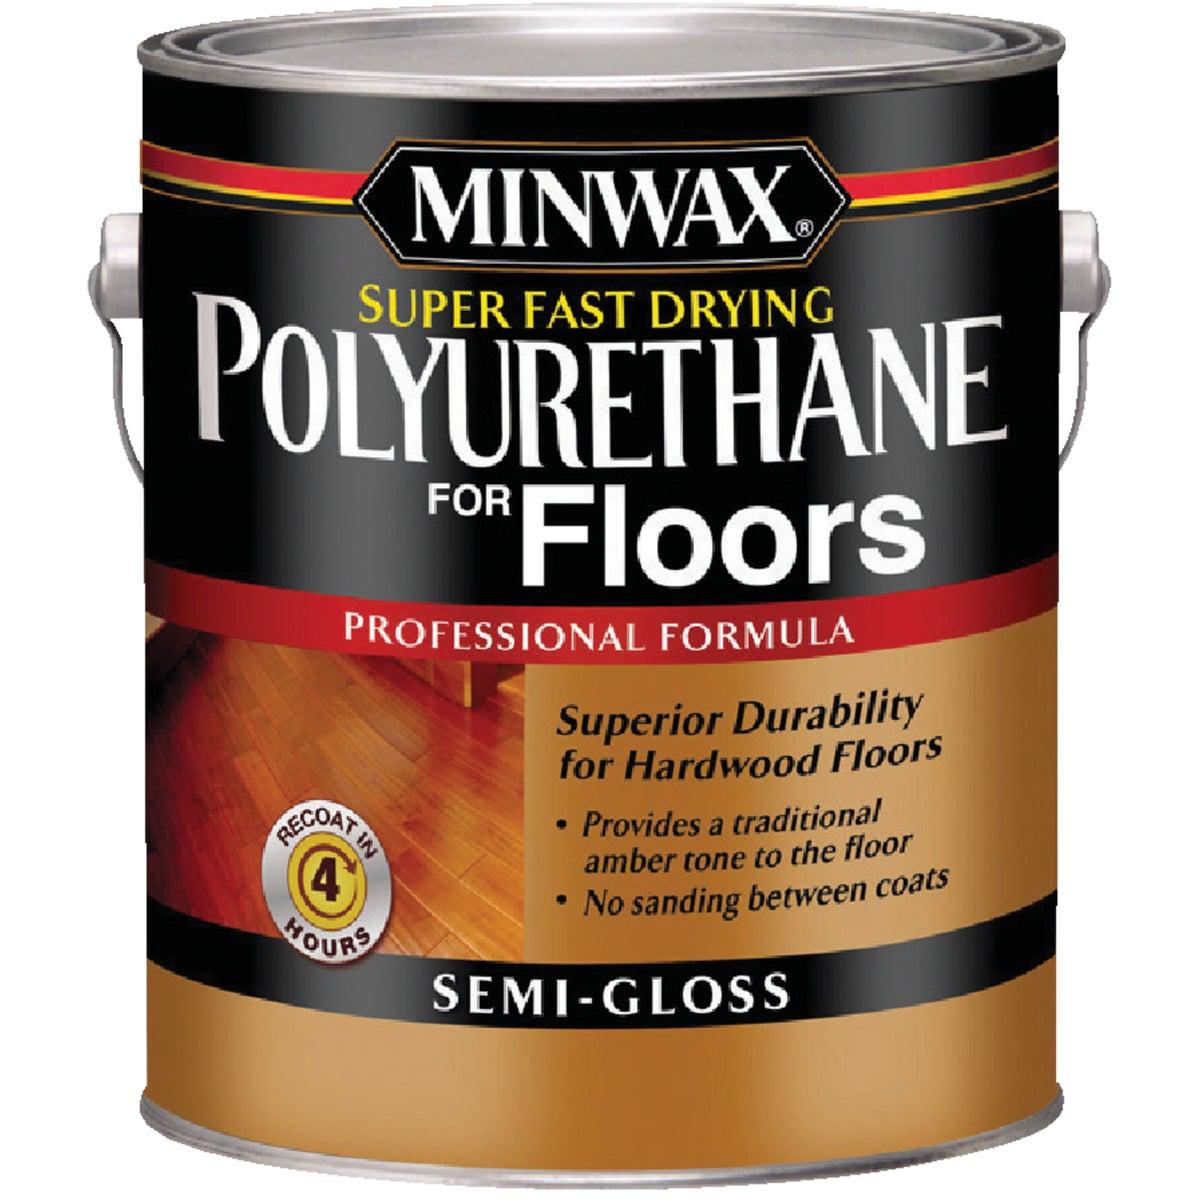 S/G FLOOR POLYURETHANE - 13021 by Minwax Company